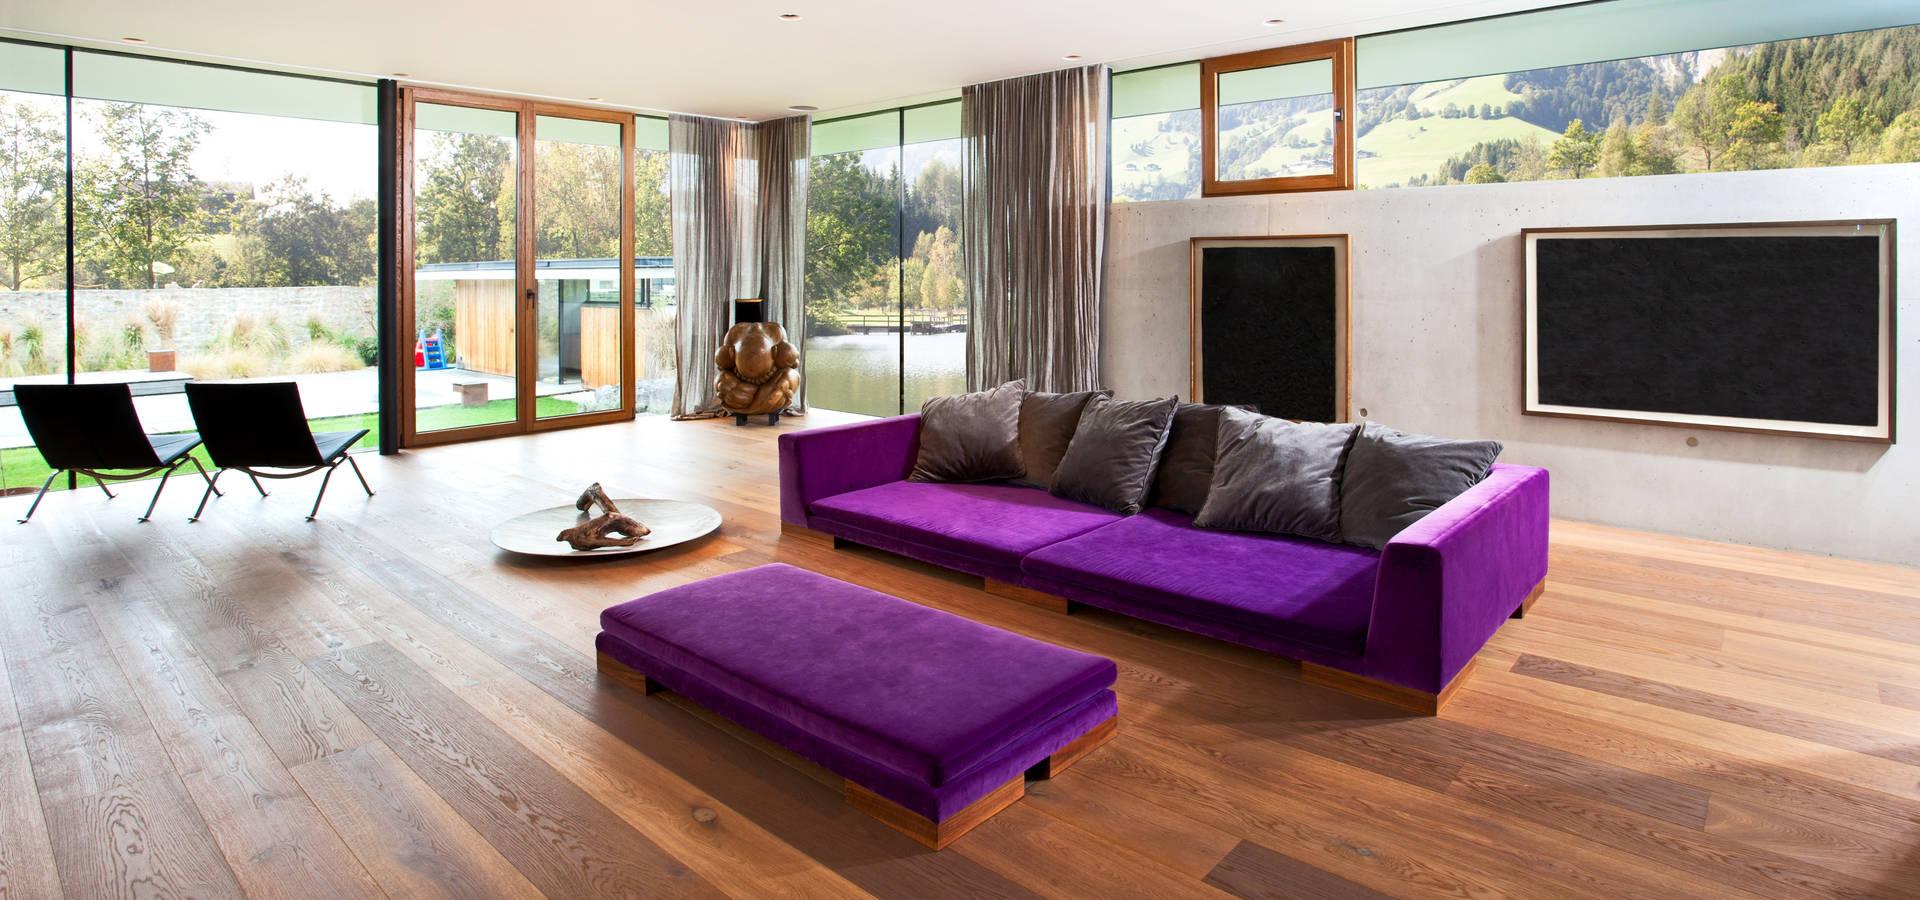 hain parkett bodenbel ge in rott am inn homify. Black Bedroom Furniture Sets. Home Design Ideas